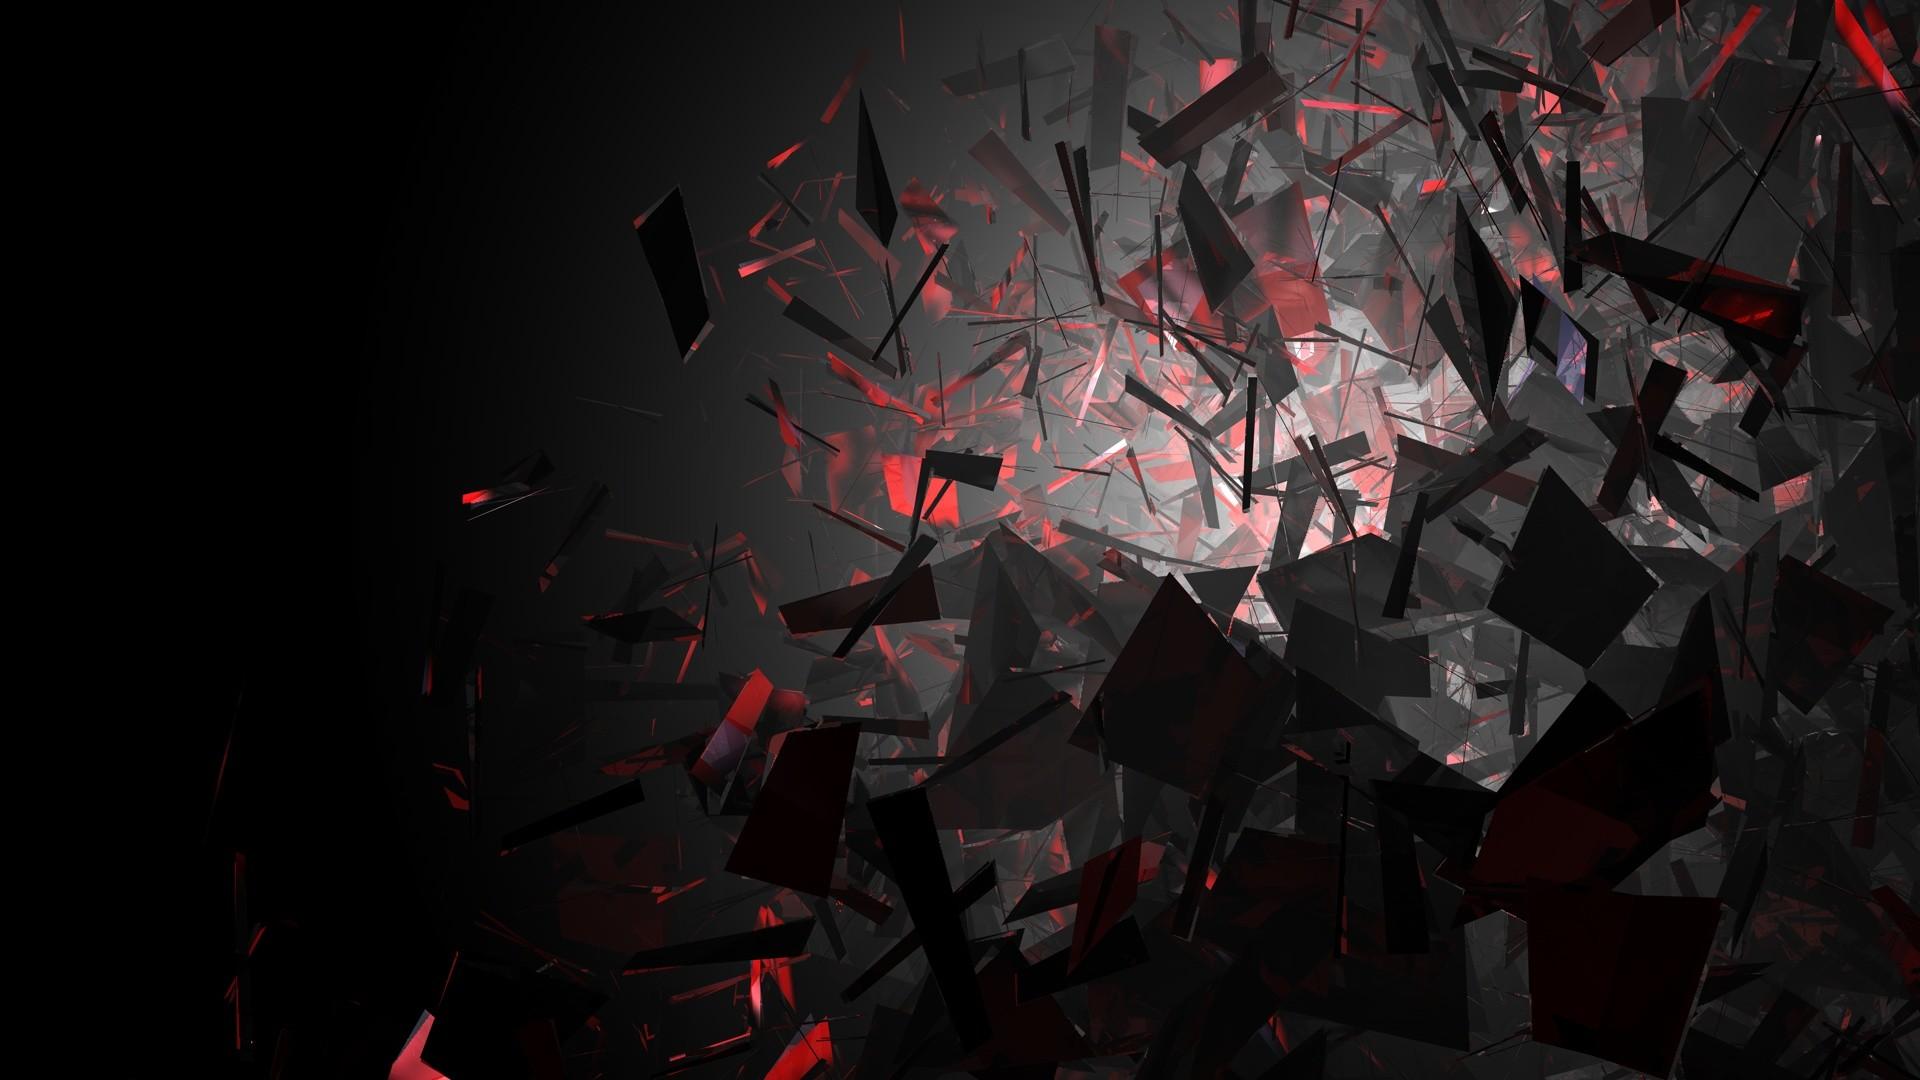 Download Abstract Dark Wallpaper Wallpoper 172290